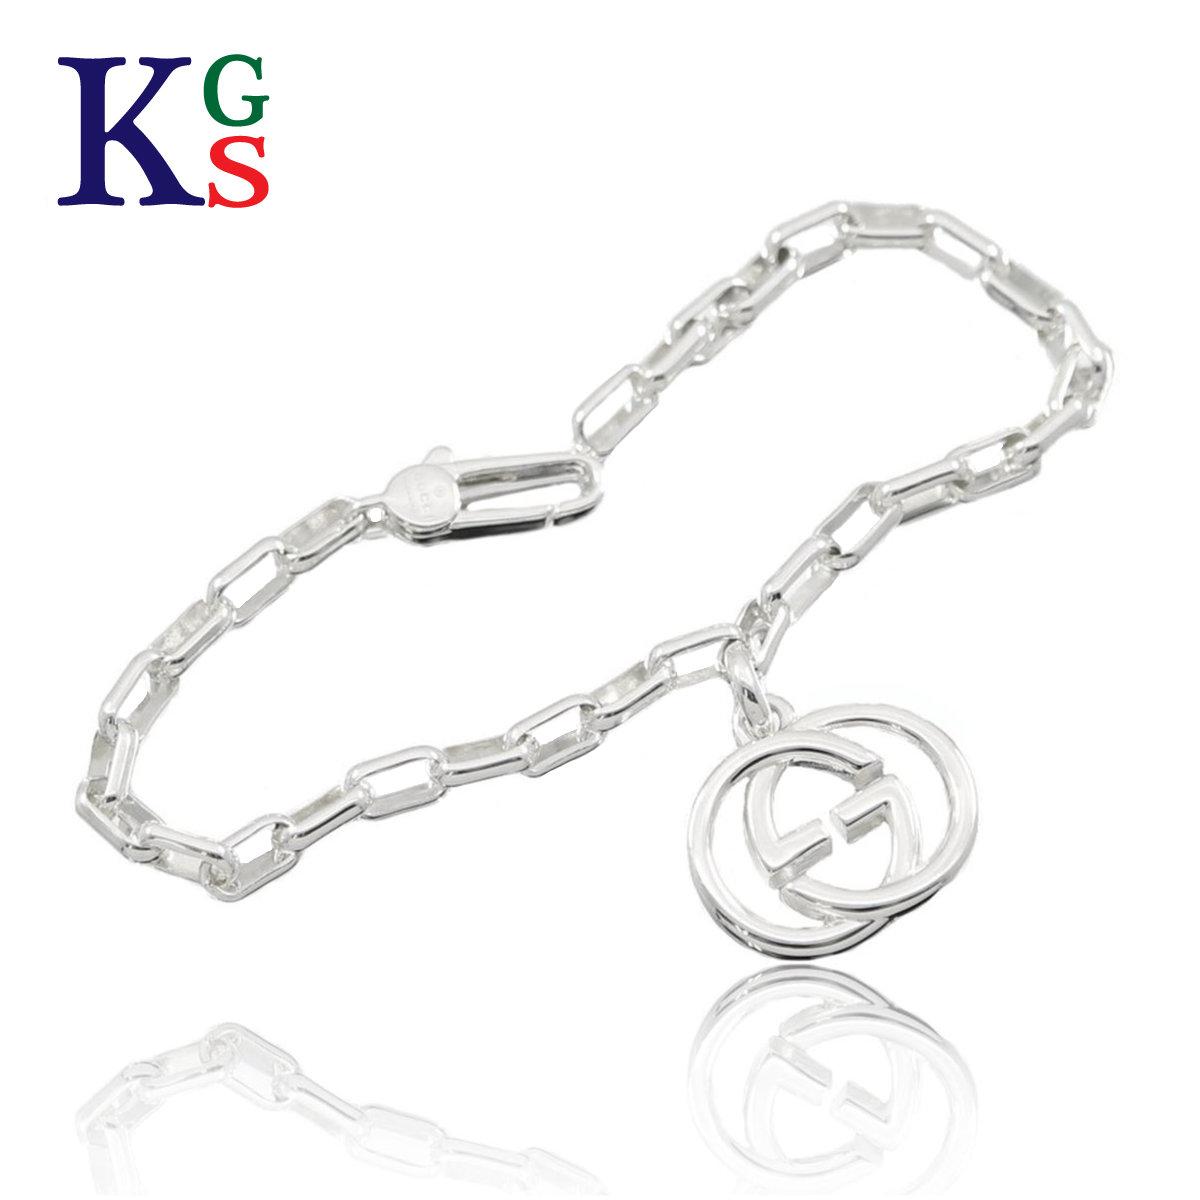 d76cc834d karyon: Gucci /GUCCI Lady's jewelry jewelry double GG interlocking grip G  charm bracelet Ag925 295711 | Rakuten Global Market